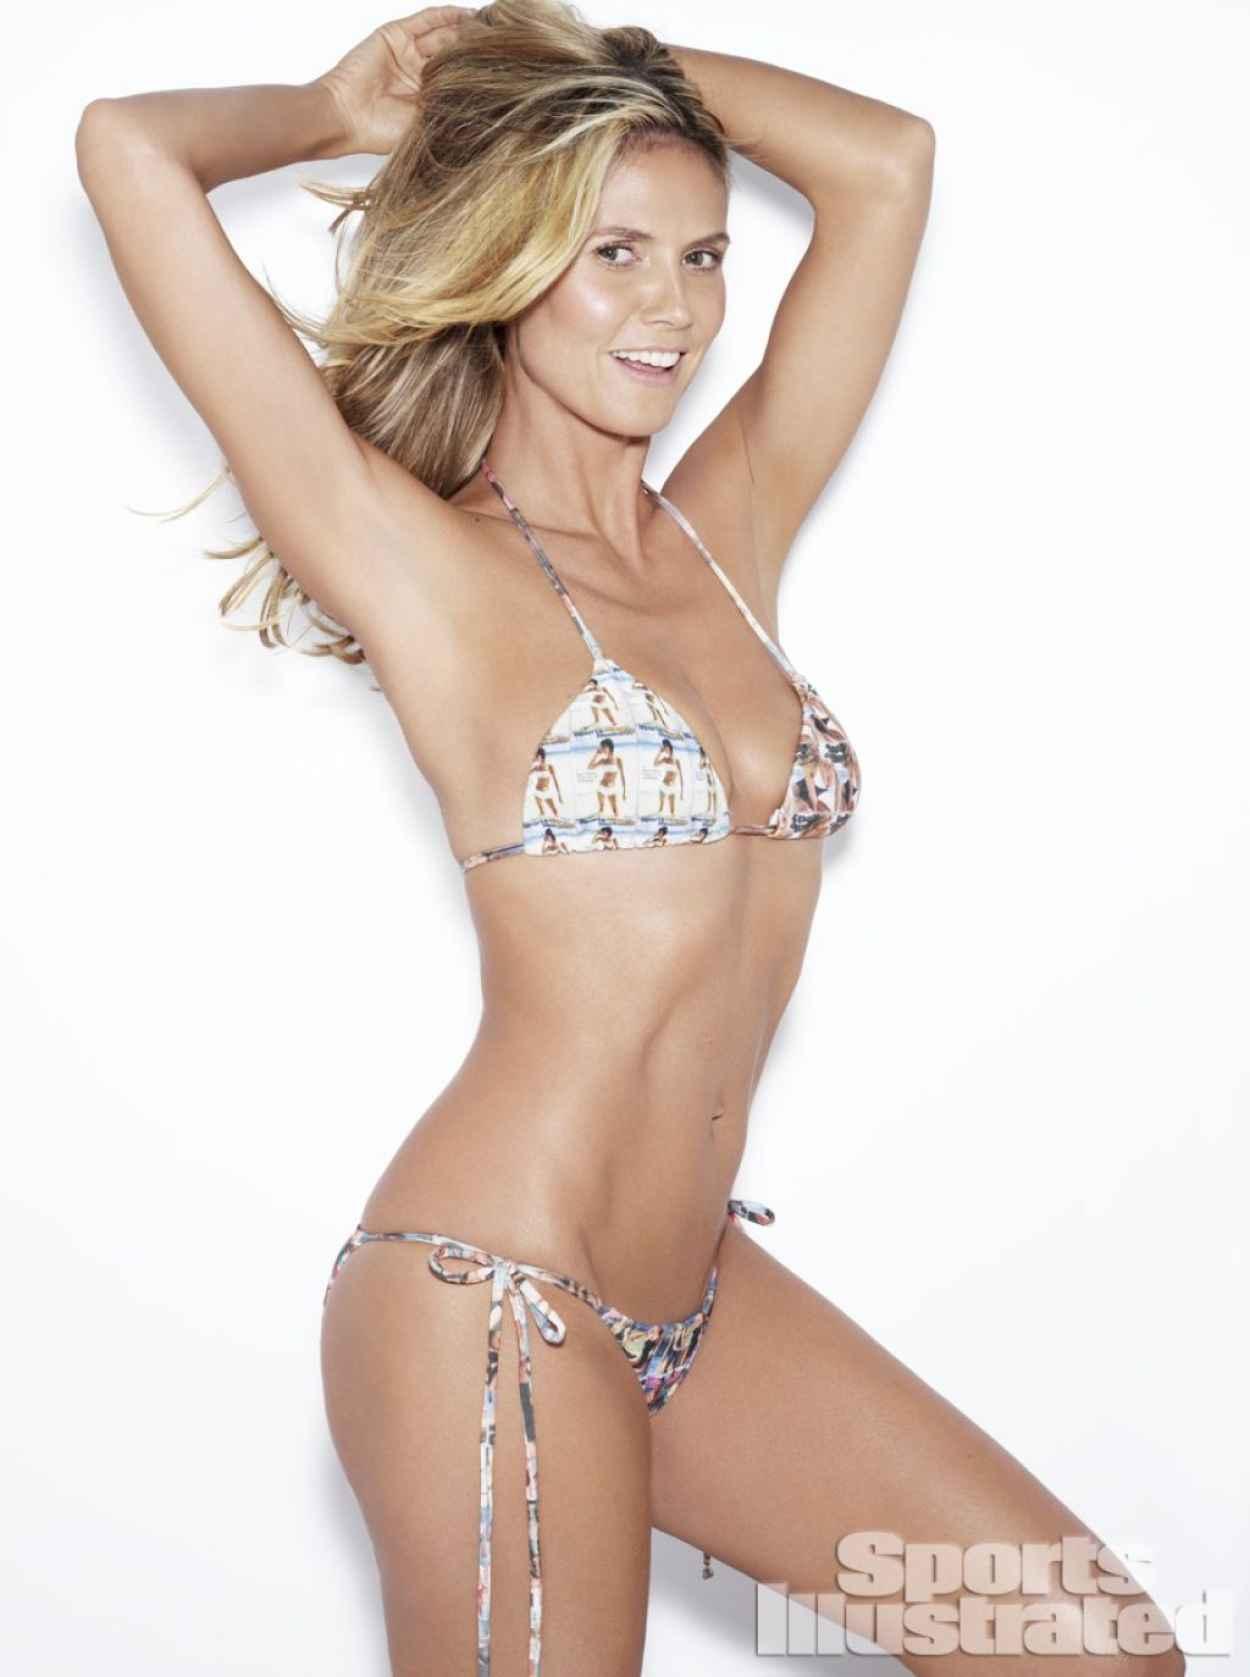 Heidi Klum - Sports Illustrated Swimwear Photoshoot 2015-1